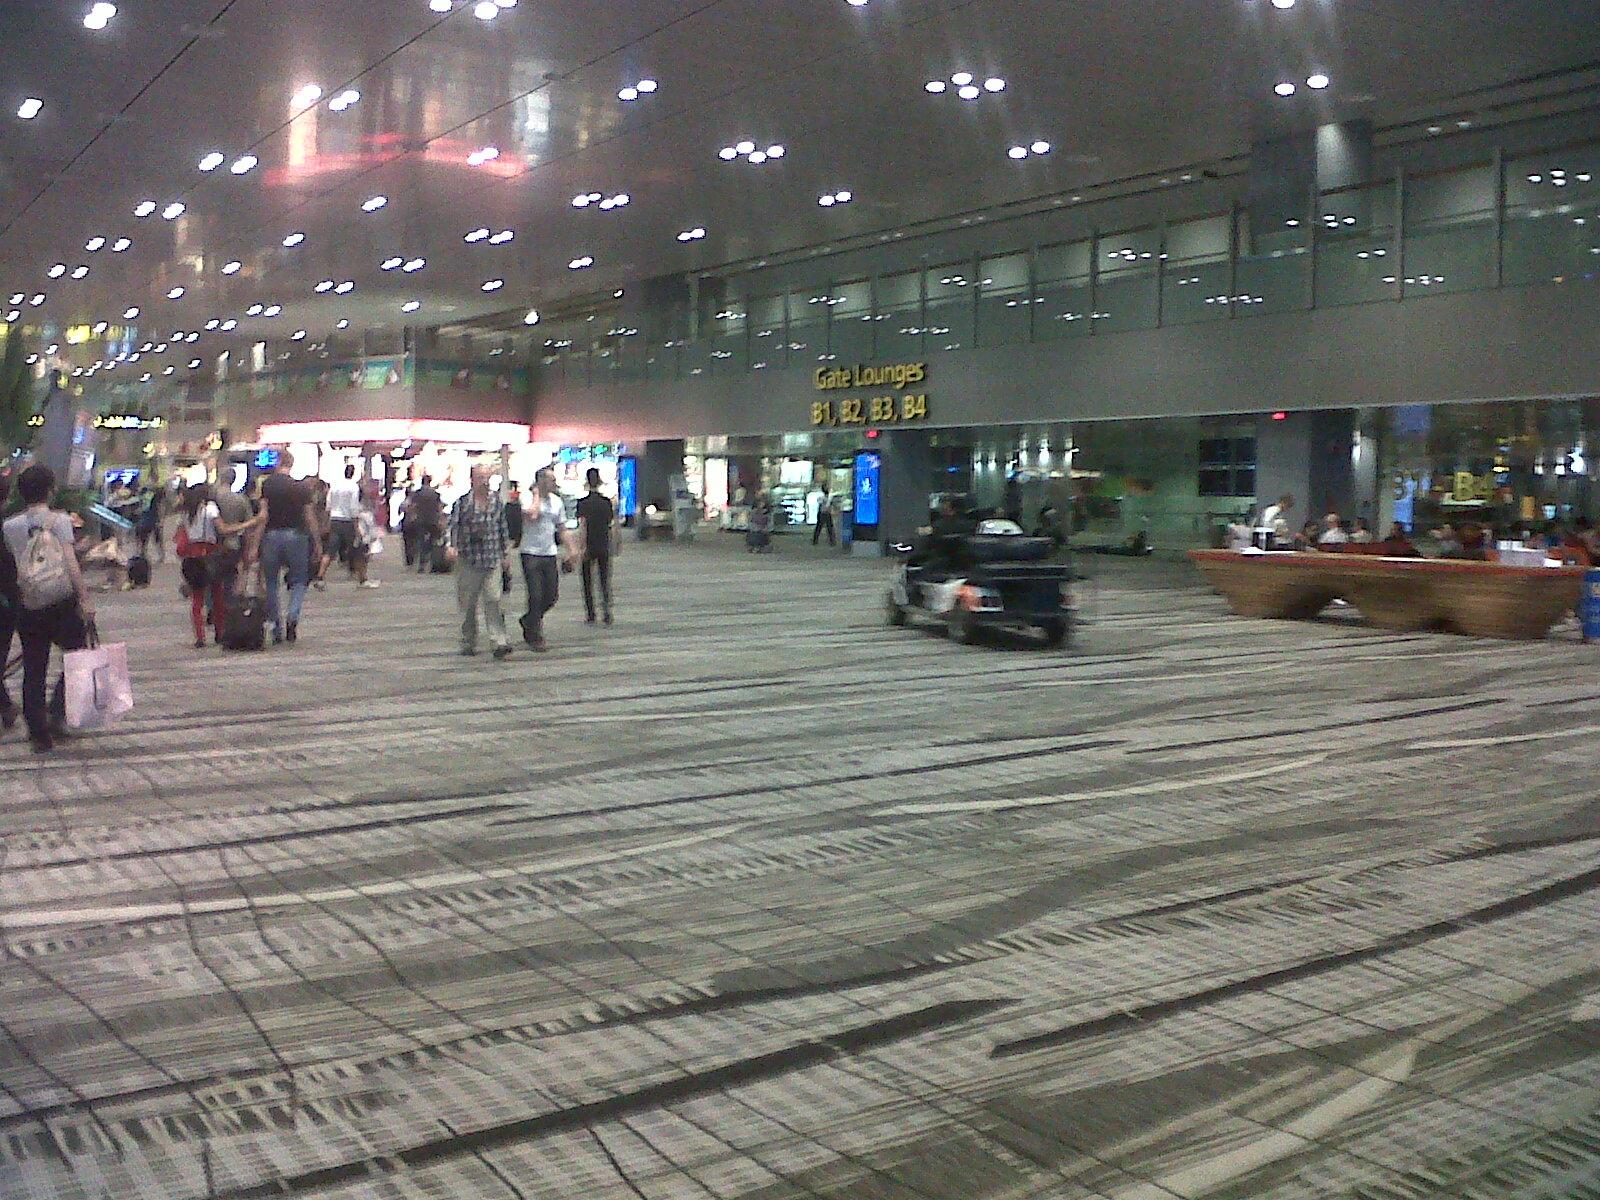 singapore-lobby-t3-changi-airpt-feb13